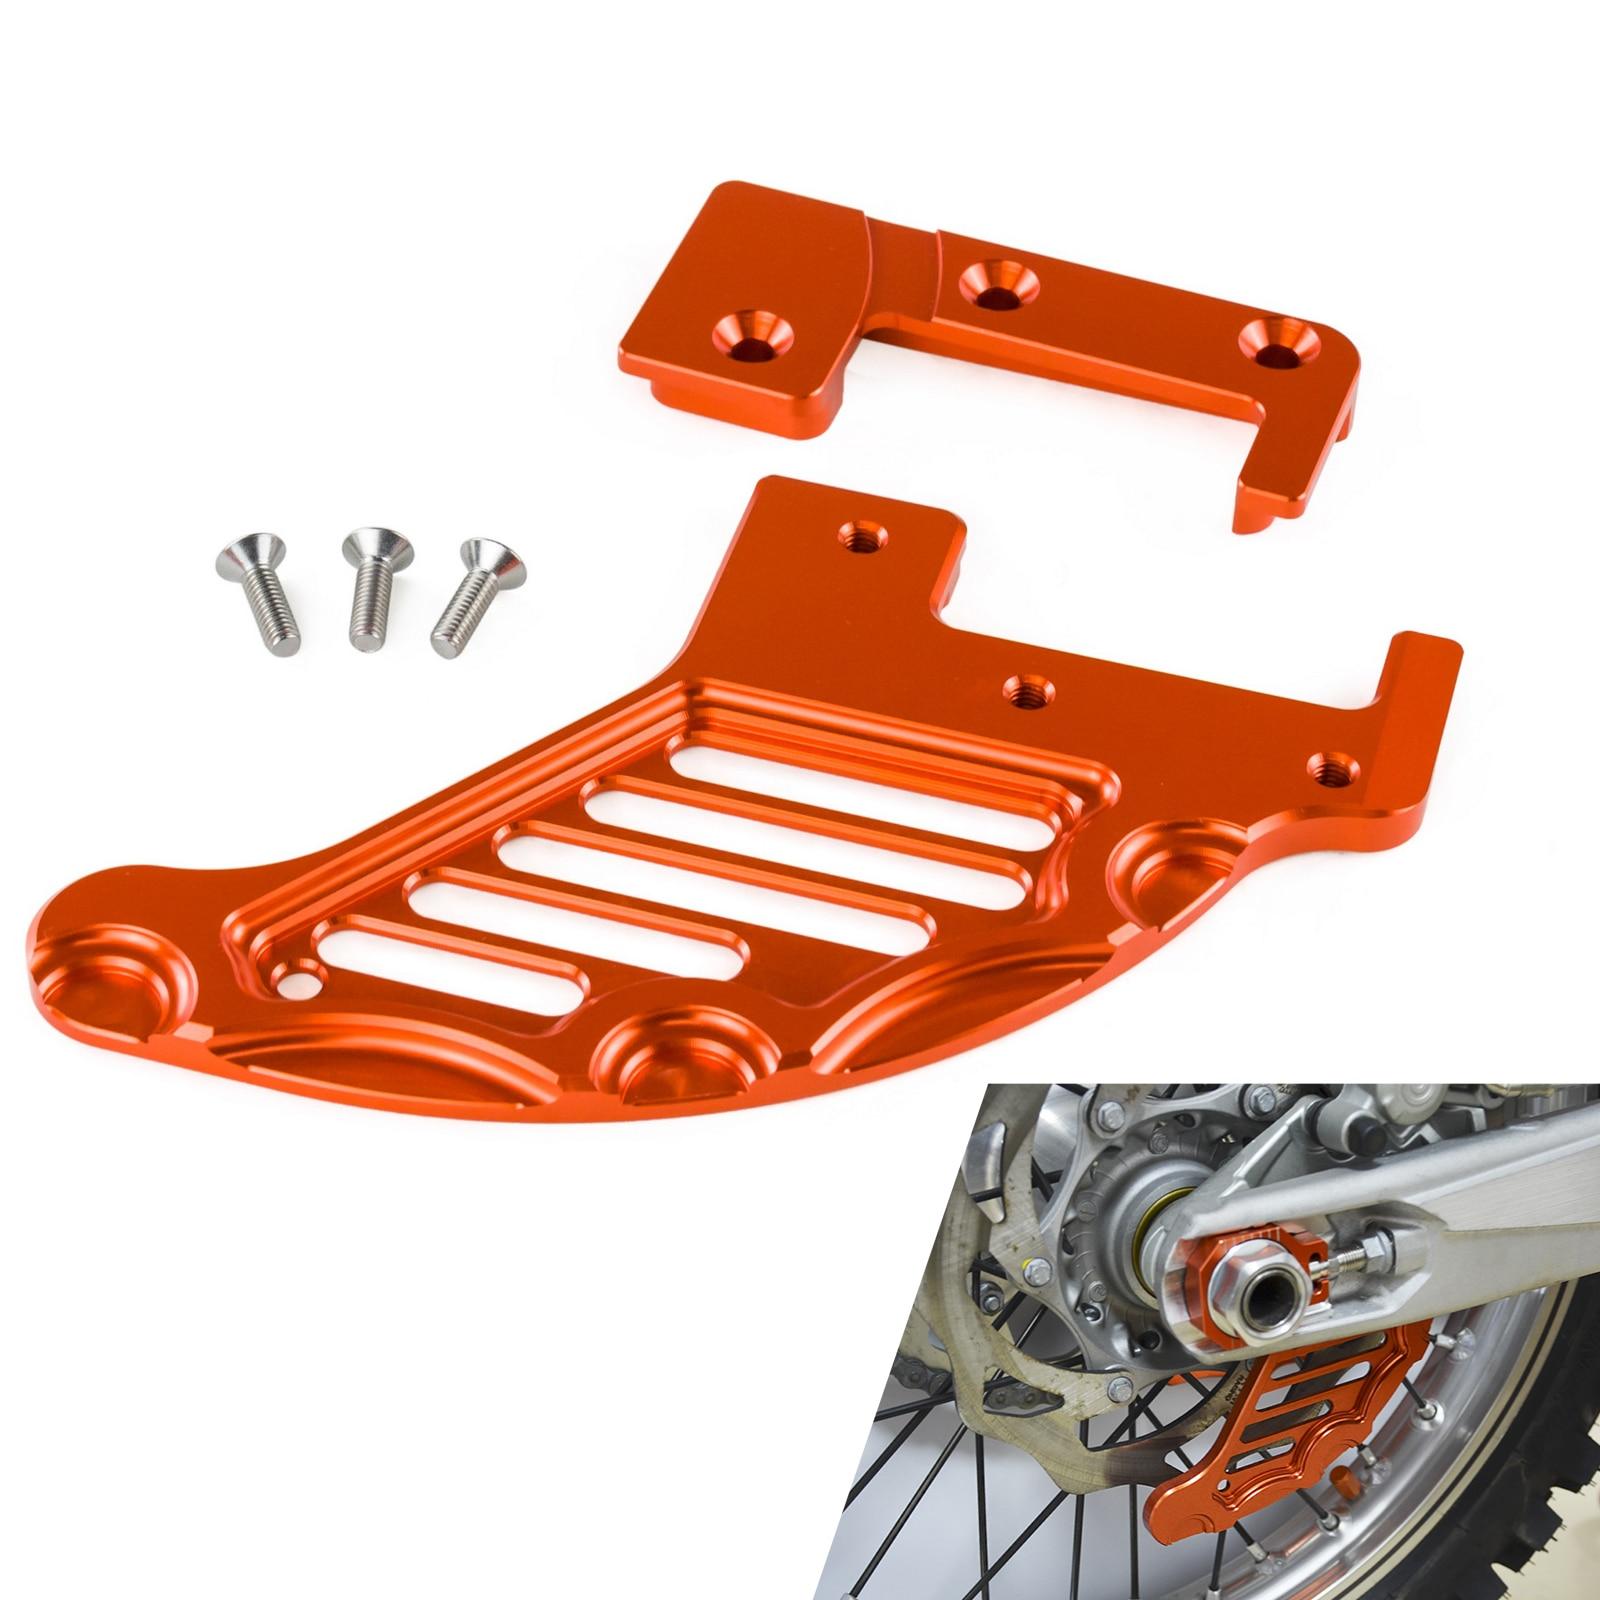 Rear Brake Disc Guard For KTM SX SXF EXC EXCF XC XCF XCW XCFW 125 150 200 250 300 350 400 450 500 505 530 2004-2017 2018 2019